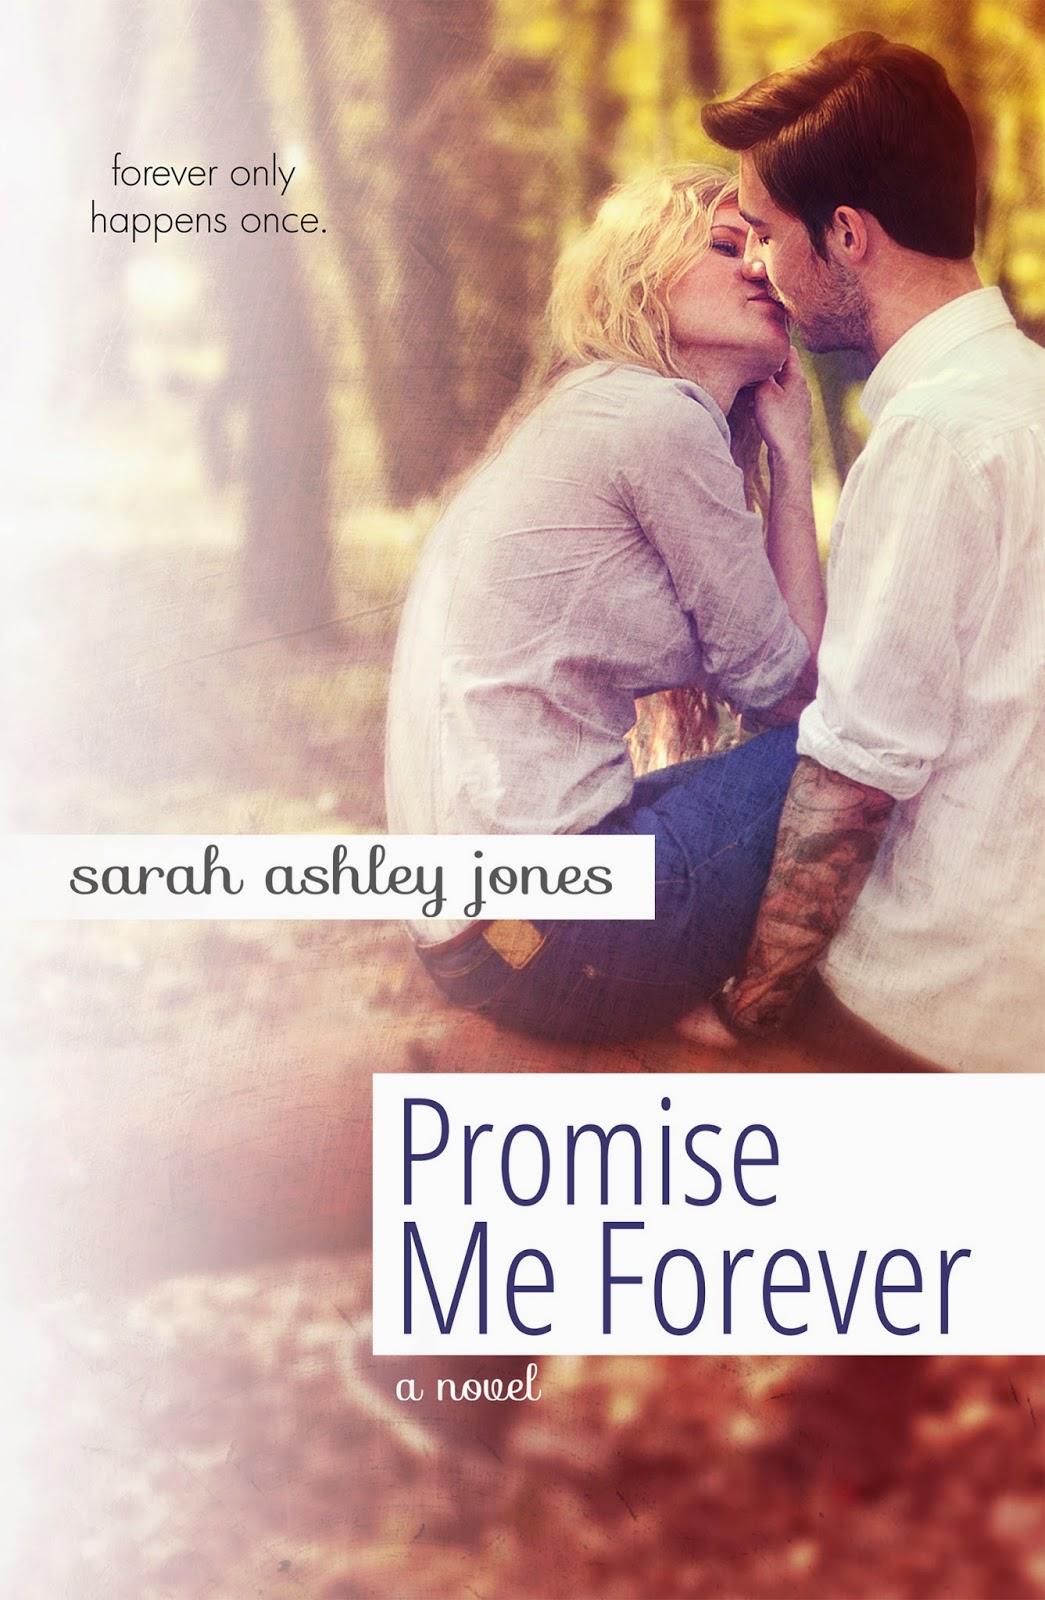 http://gabicreads.blogspot.com/2014/03/promise-me-forever-promise-me-15-by.html